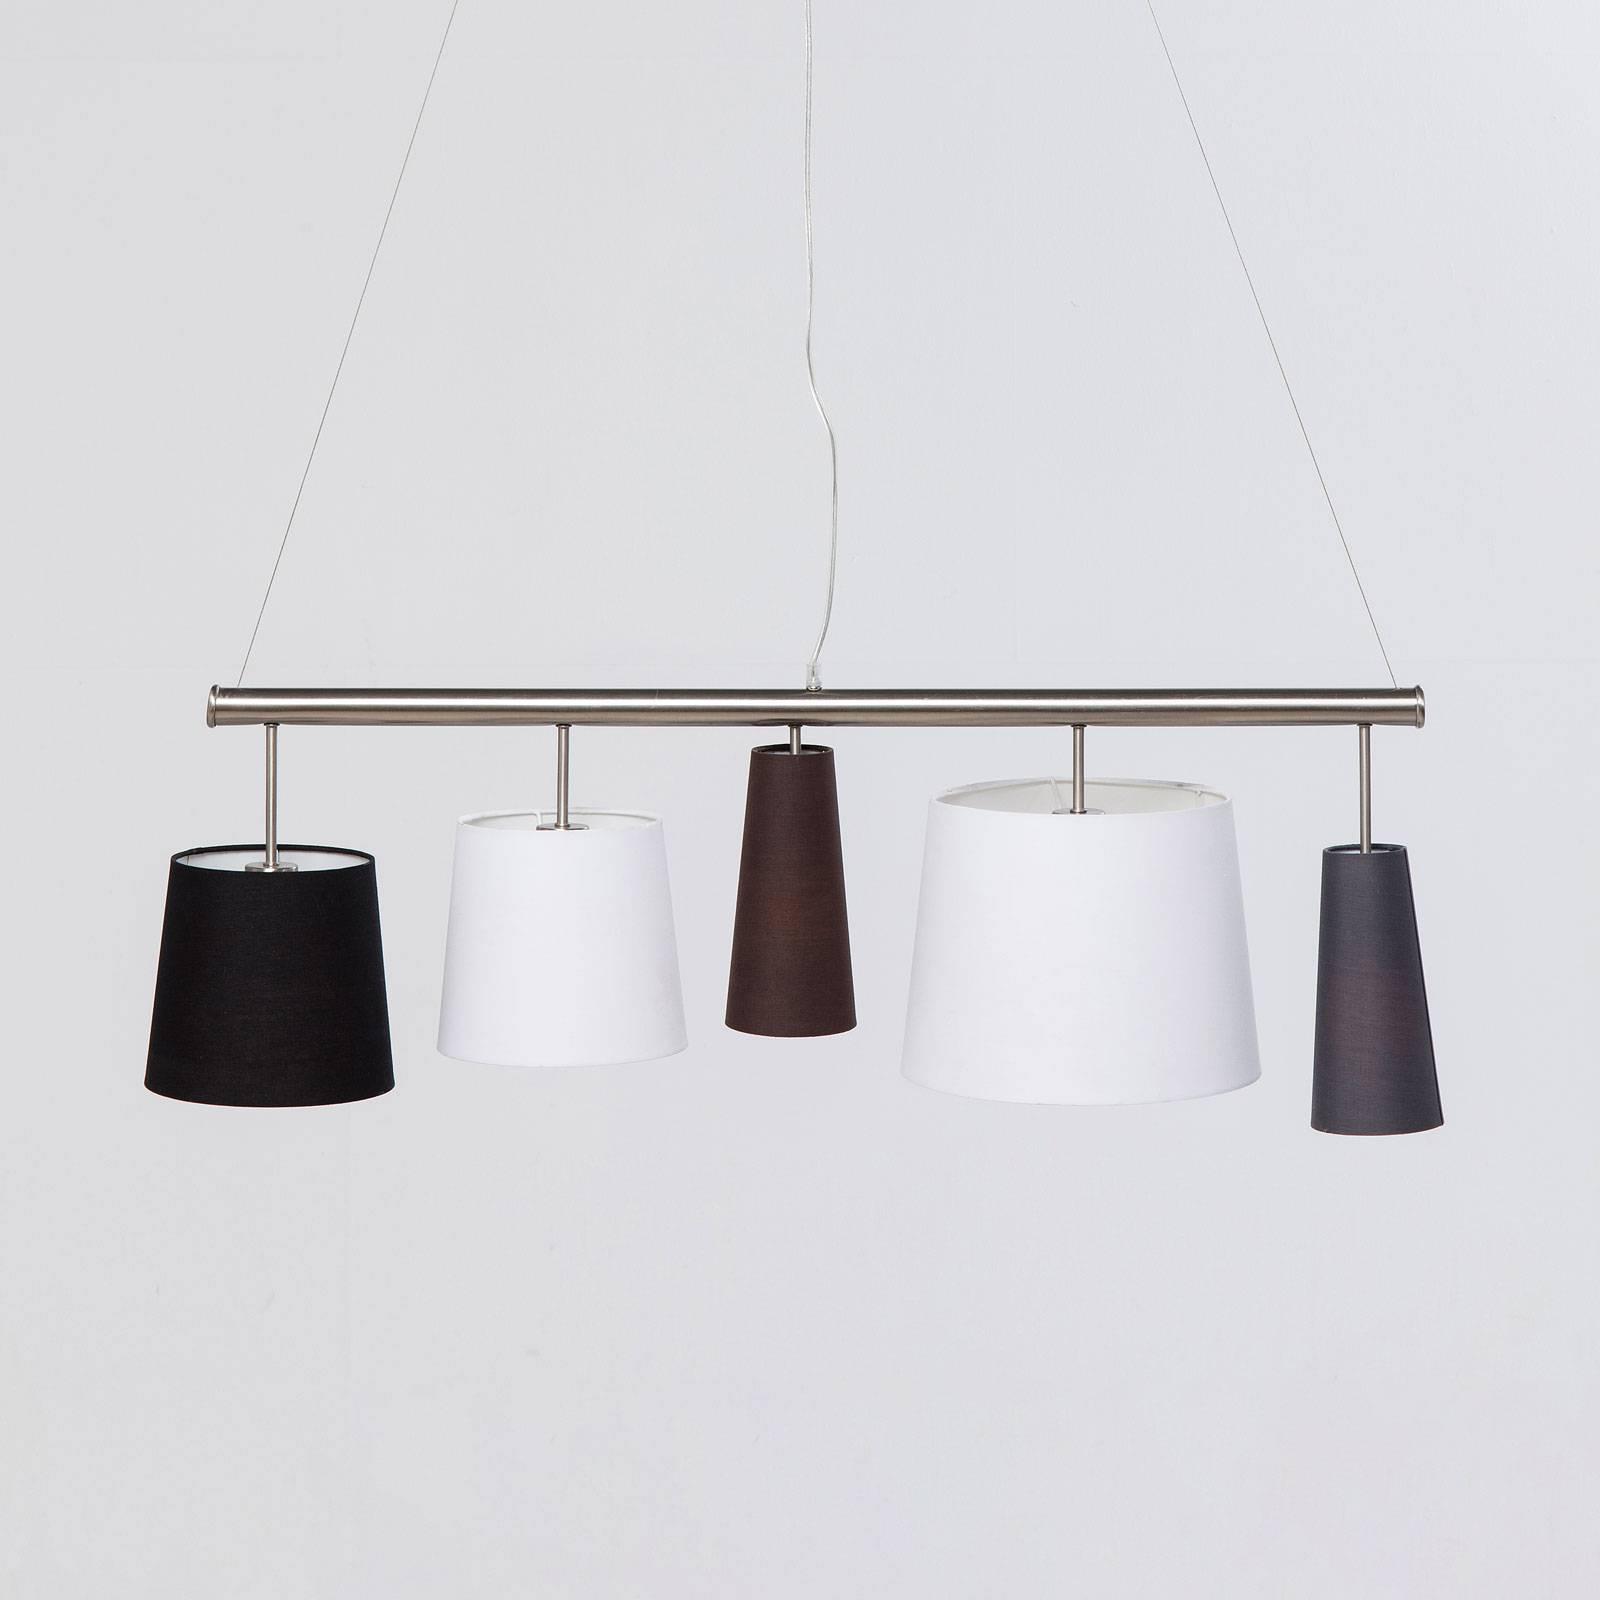 KARE Parecchi zilver hanglamp, zwart/wit